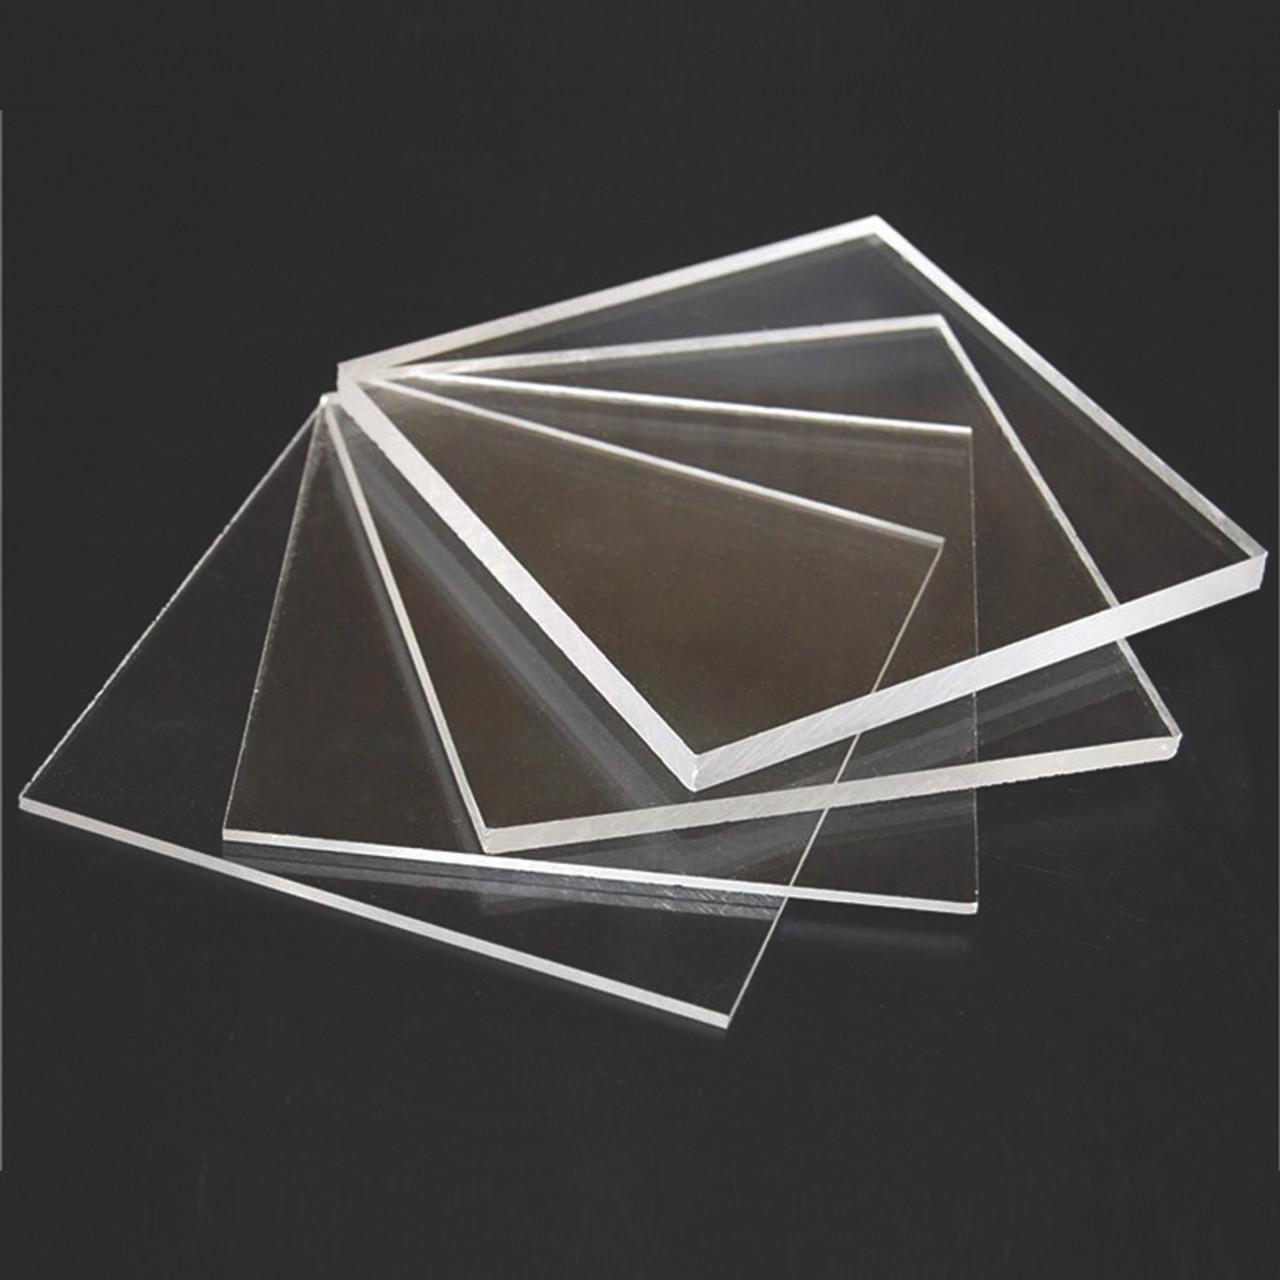 Clear Acrylic No Color Plexi Acrylic Acrylic Sheet Plastic Sheet Lucite Se